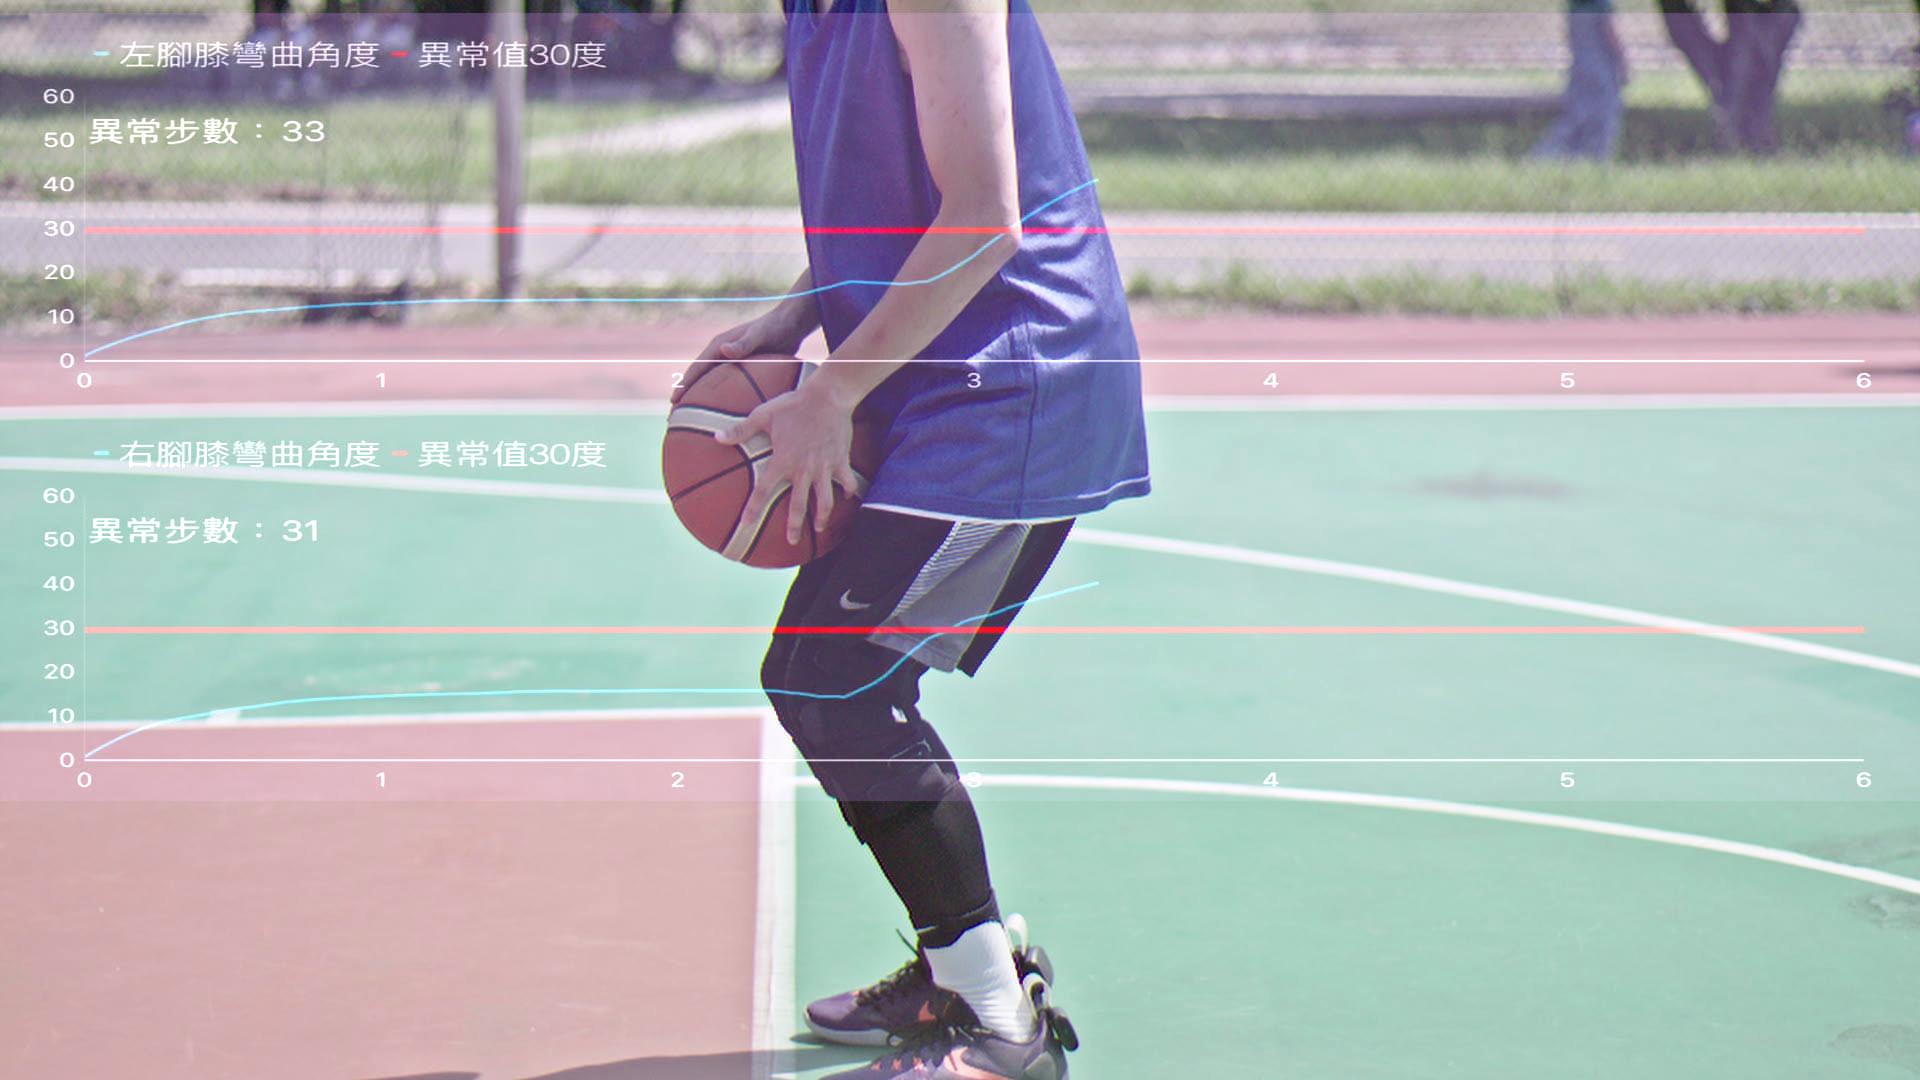 SaFePlay應用情境-籃球運動 膝彎曲角度